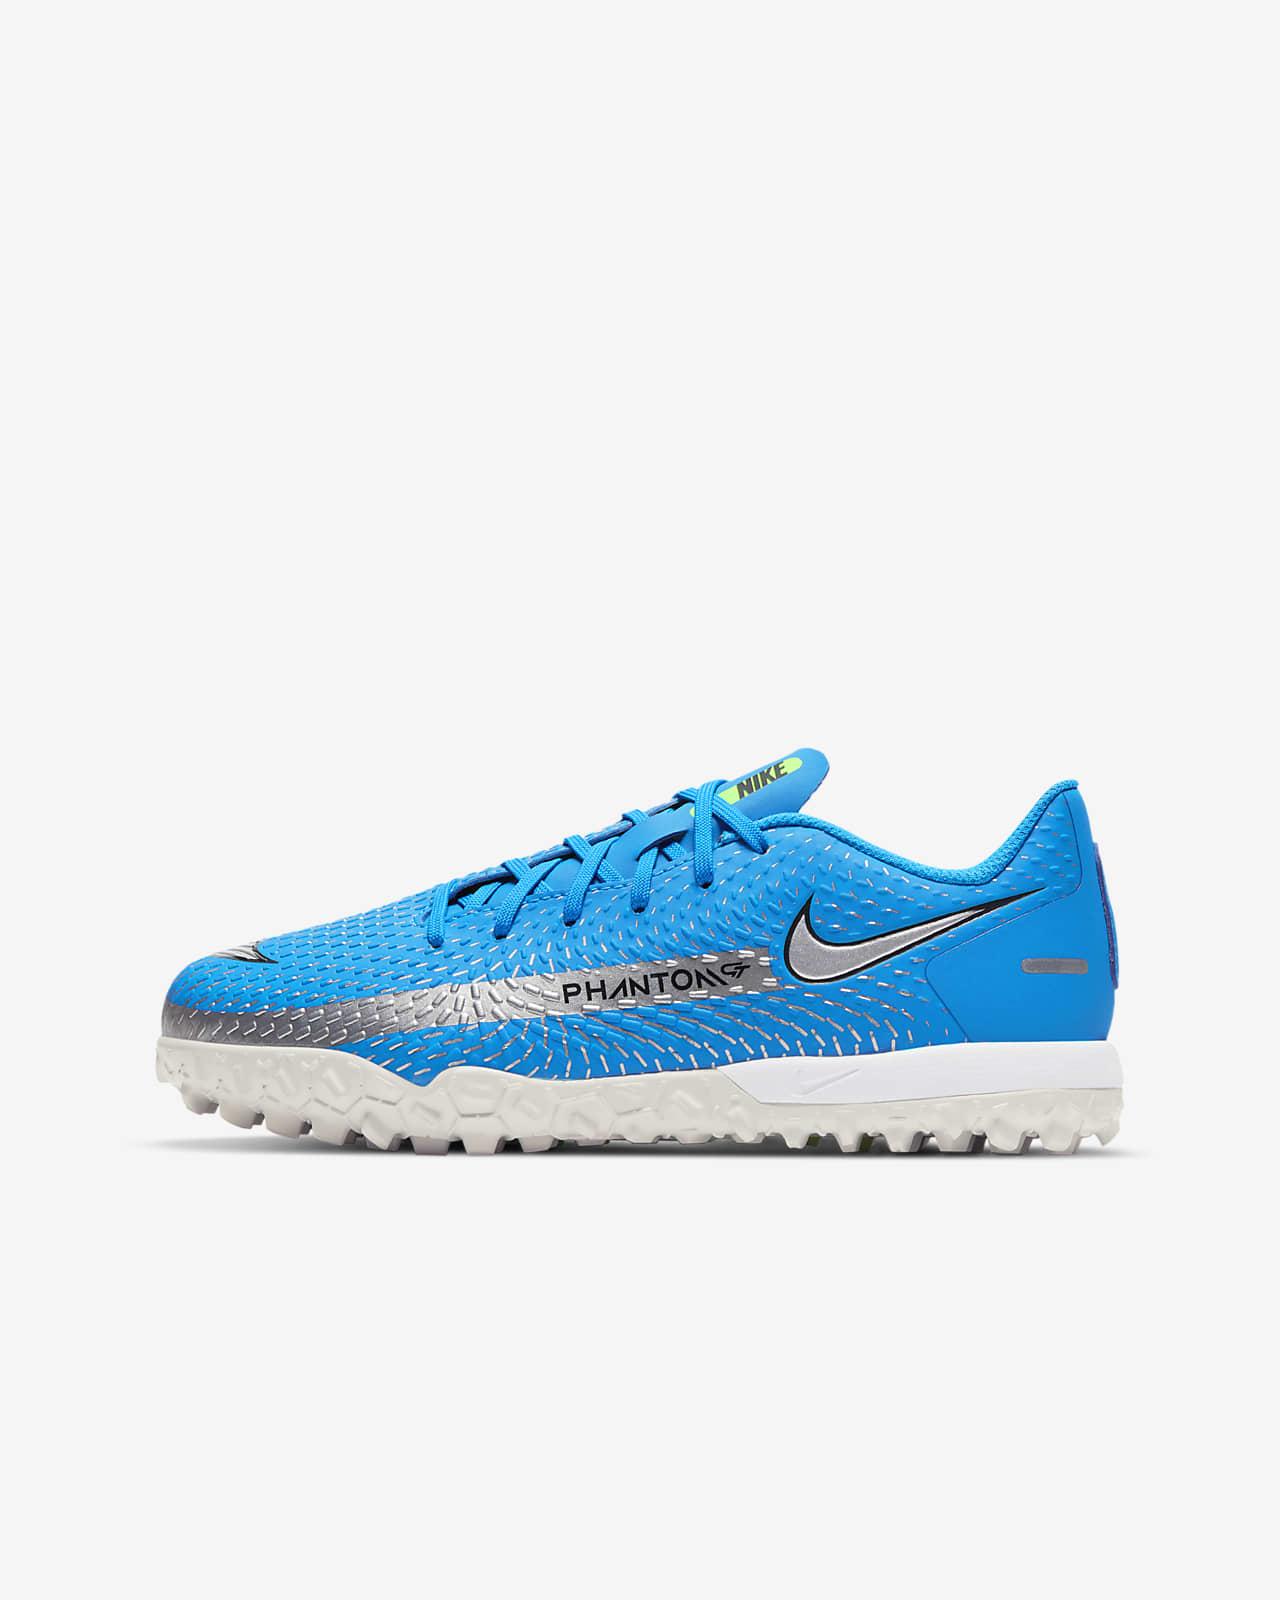 Nike Jr. Phantom GT Academy TF Younger/Older Kids' Artificial-Turf Football Shoe